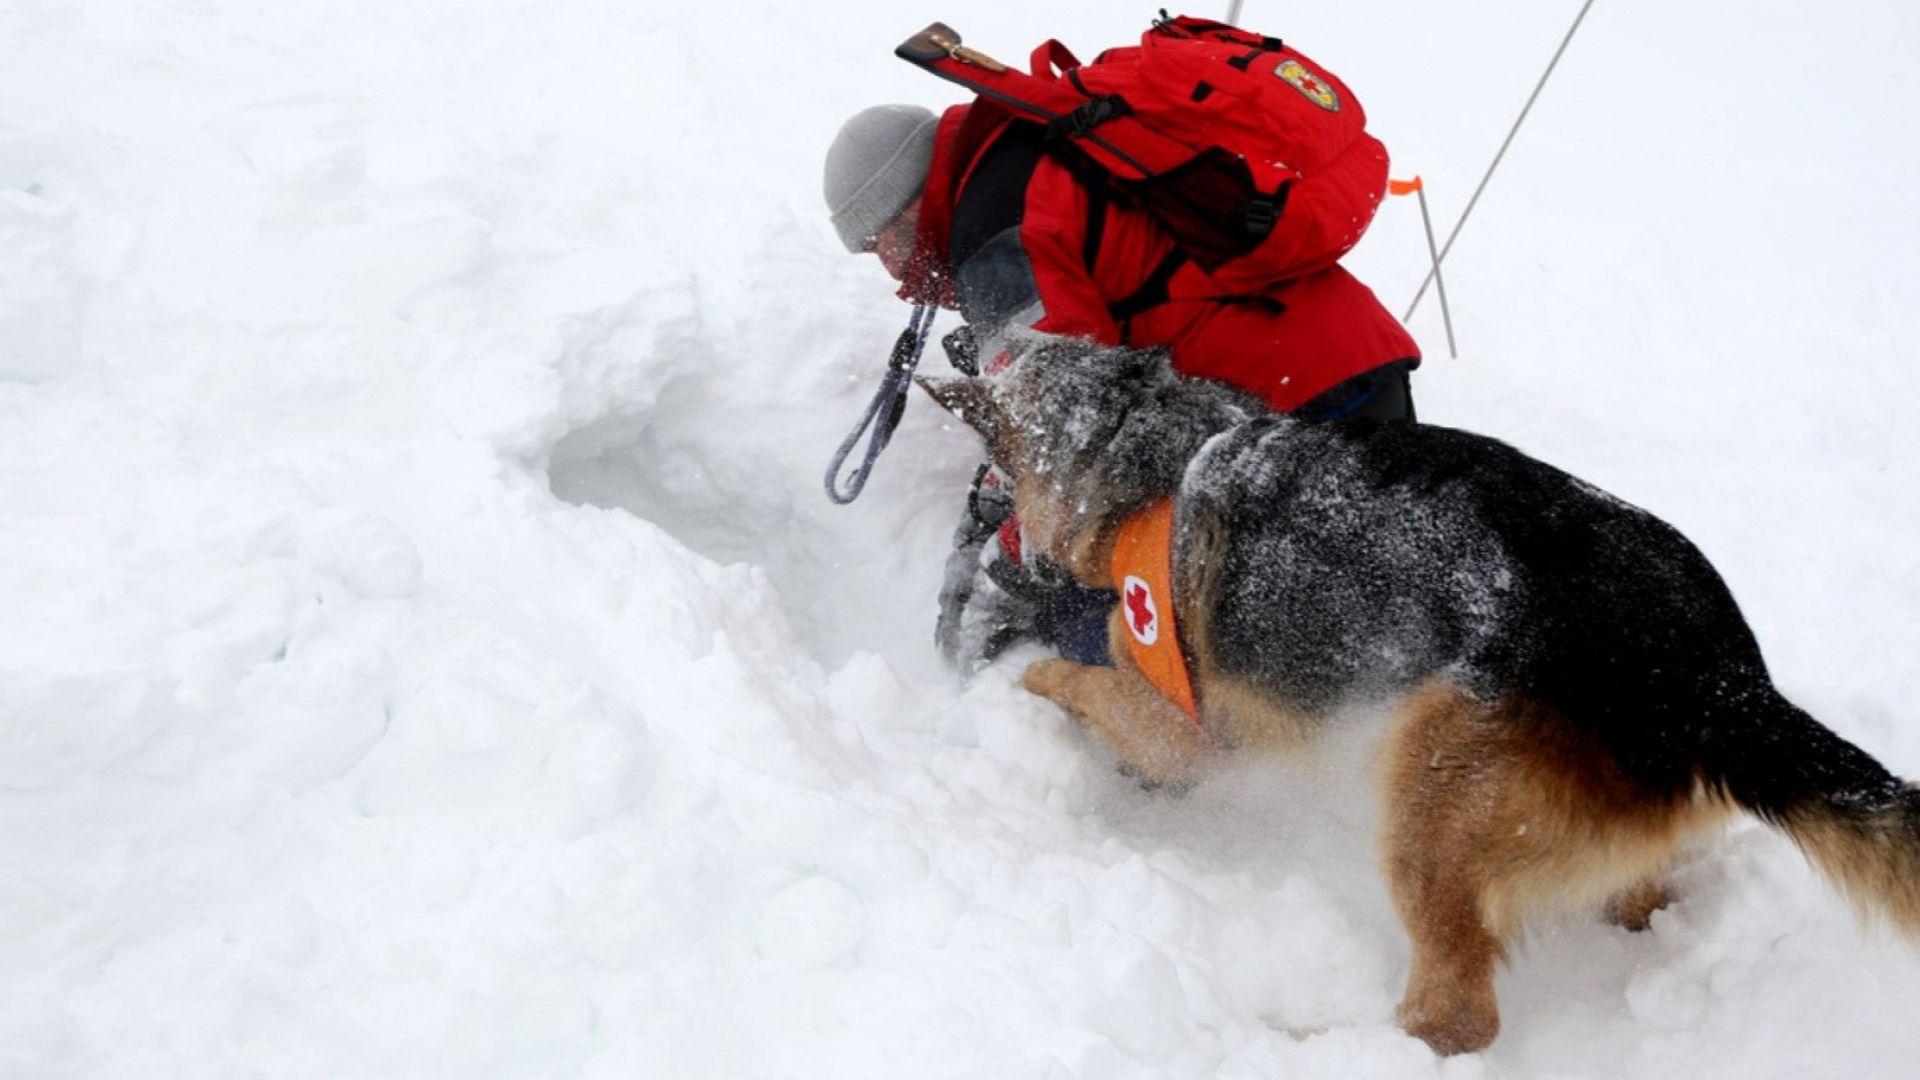 Лавина уби двама сноубордисти в Пирин